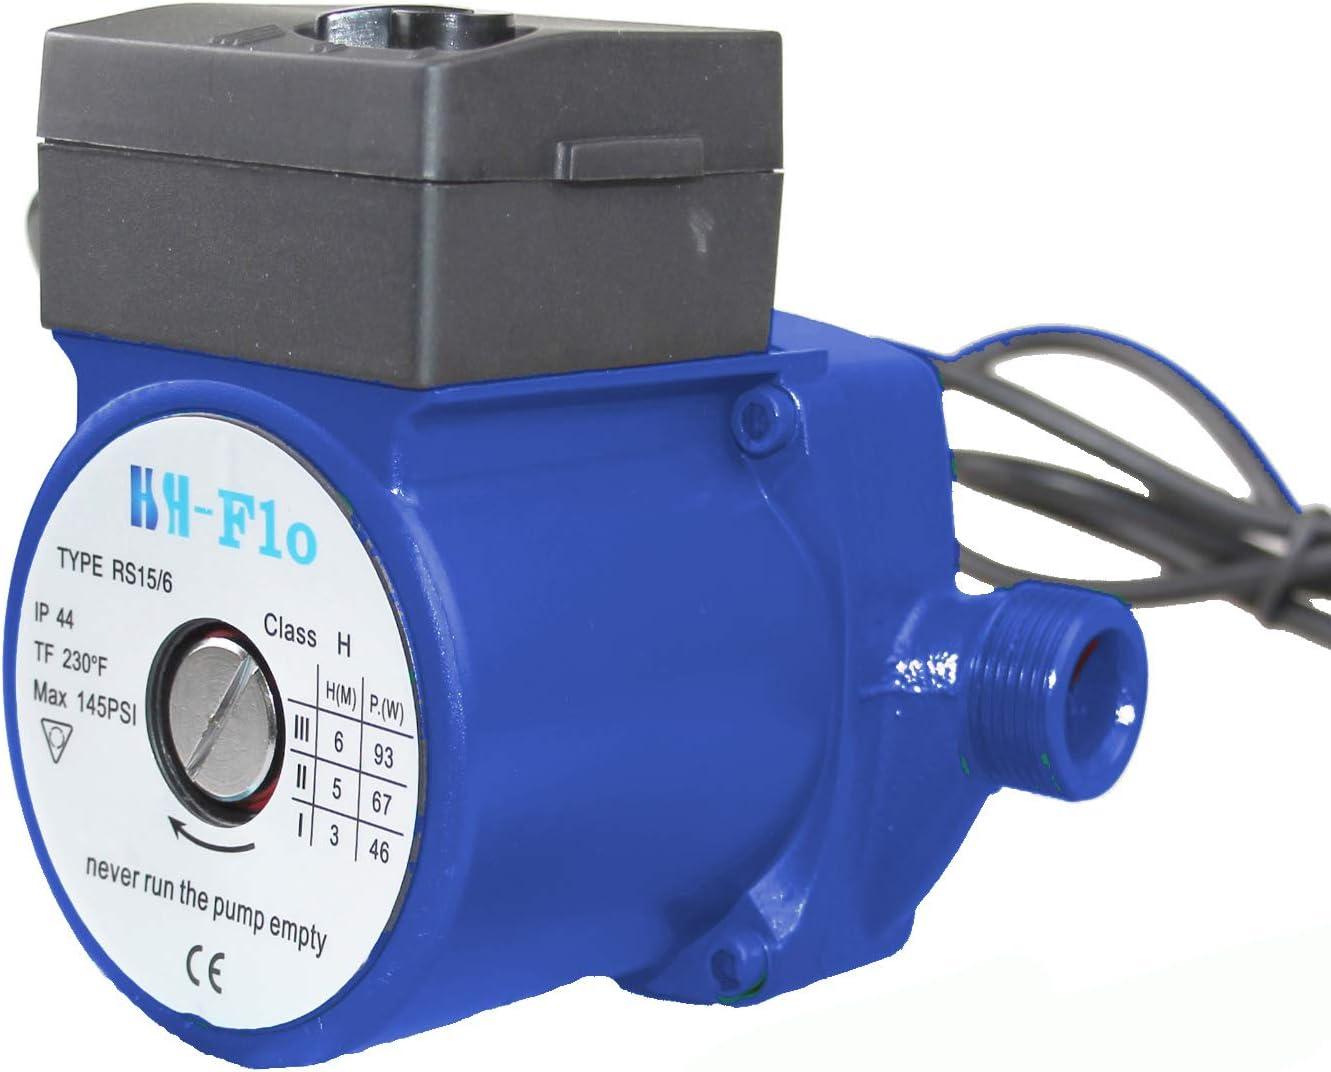 "HSH-Flo 3/4"" NPT 20Ft/29Ft 110VAC 60Hz Cast Iron/Stainless Steel Hot Water Circulator Pump/Circulation Pump For Solar Heater (20Ft Head Cast Iron)"